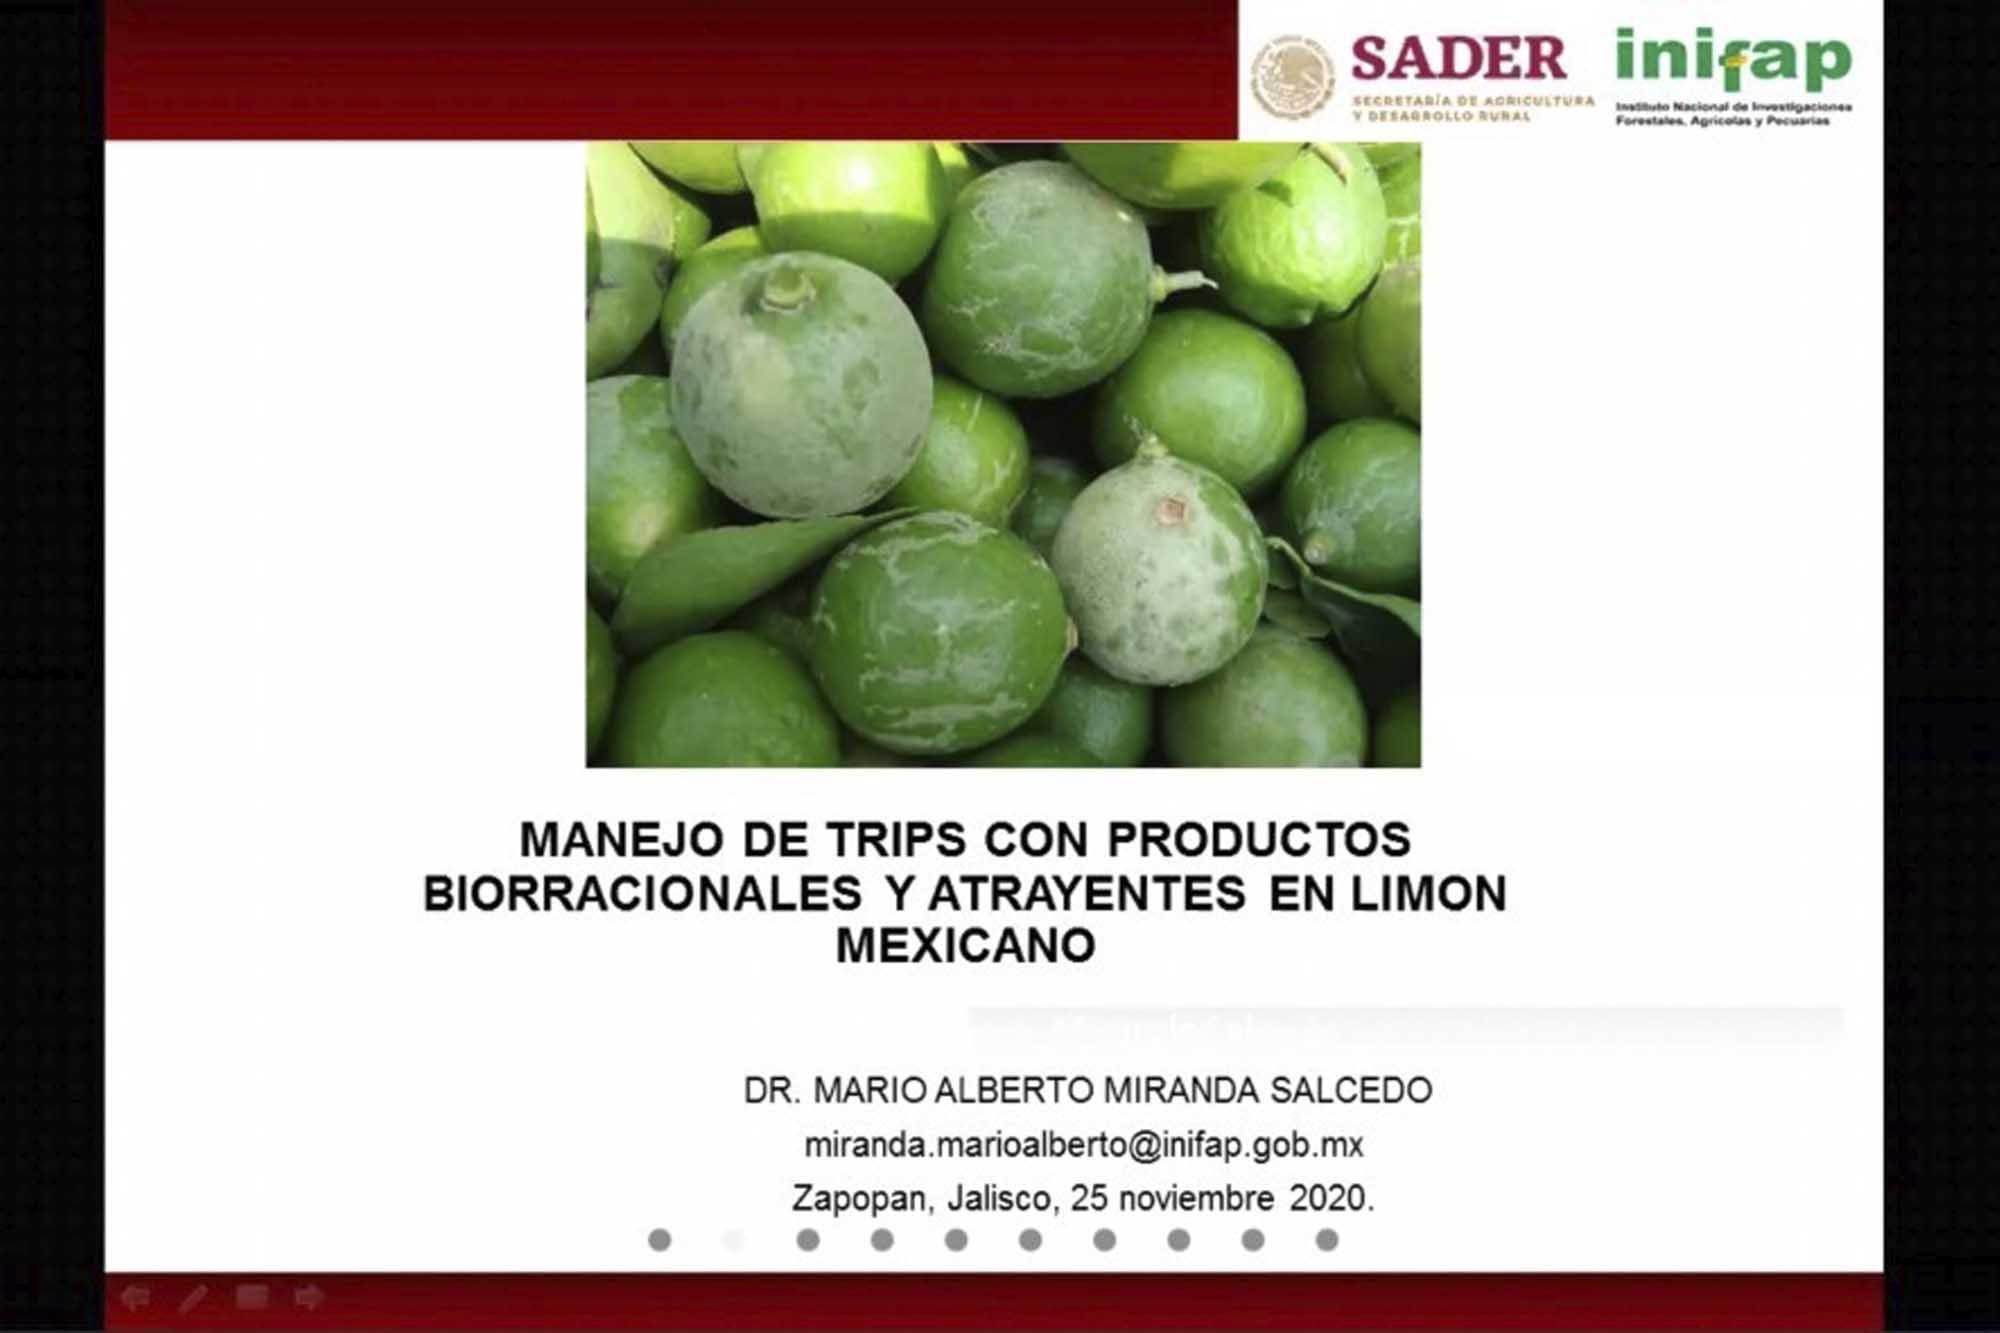 Coloquio agropecuarios y biológicos 301120